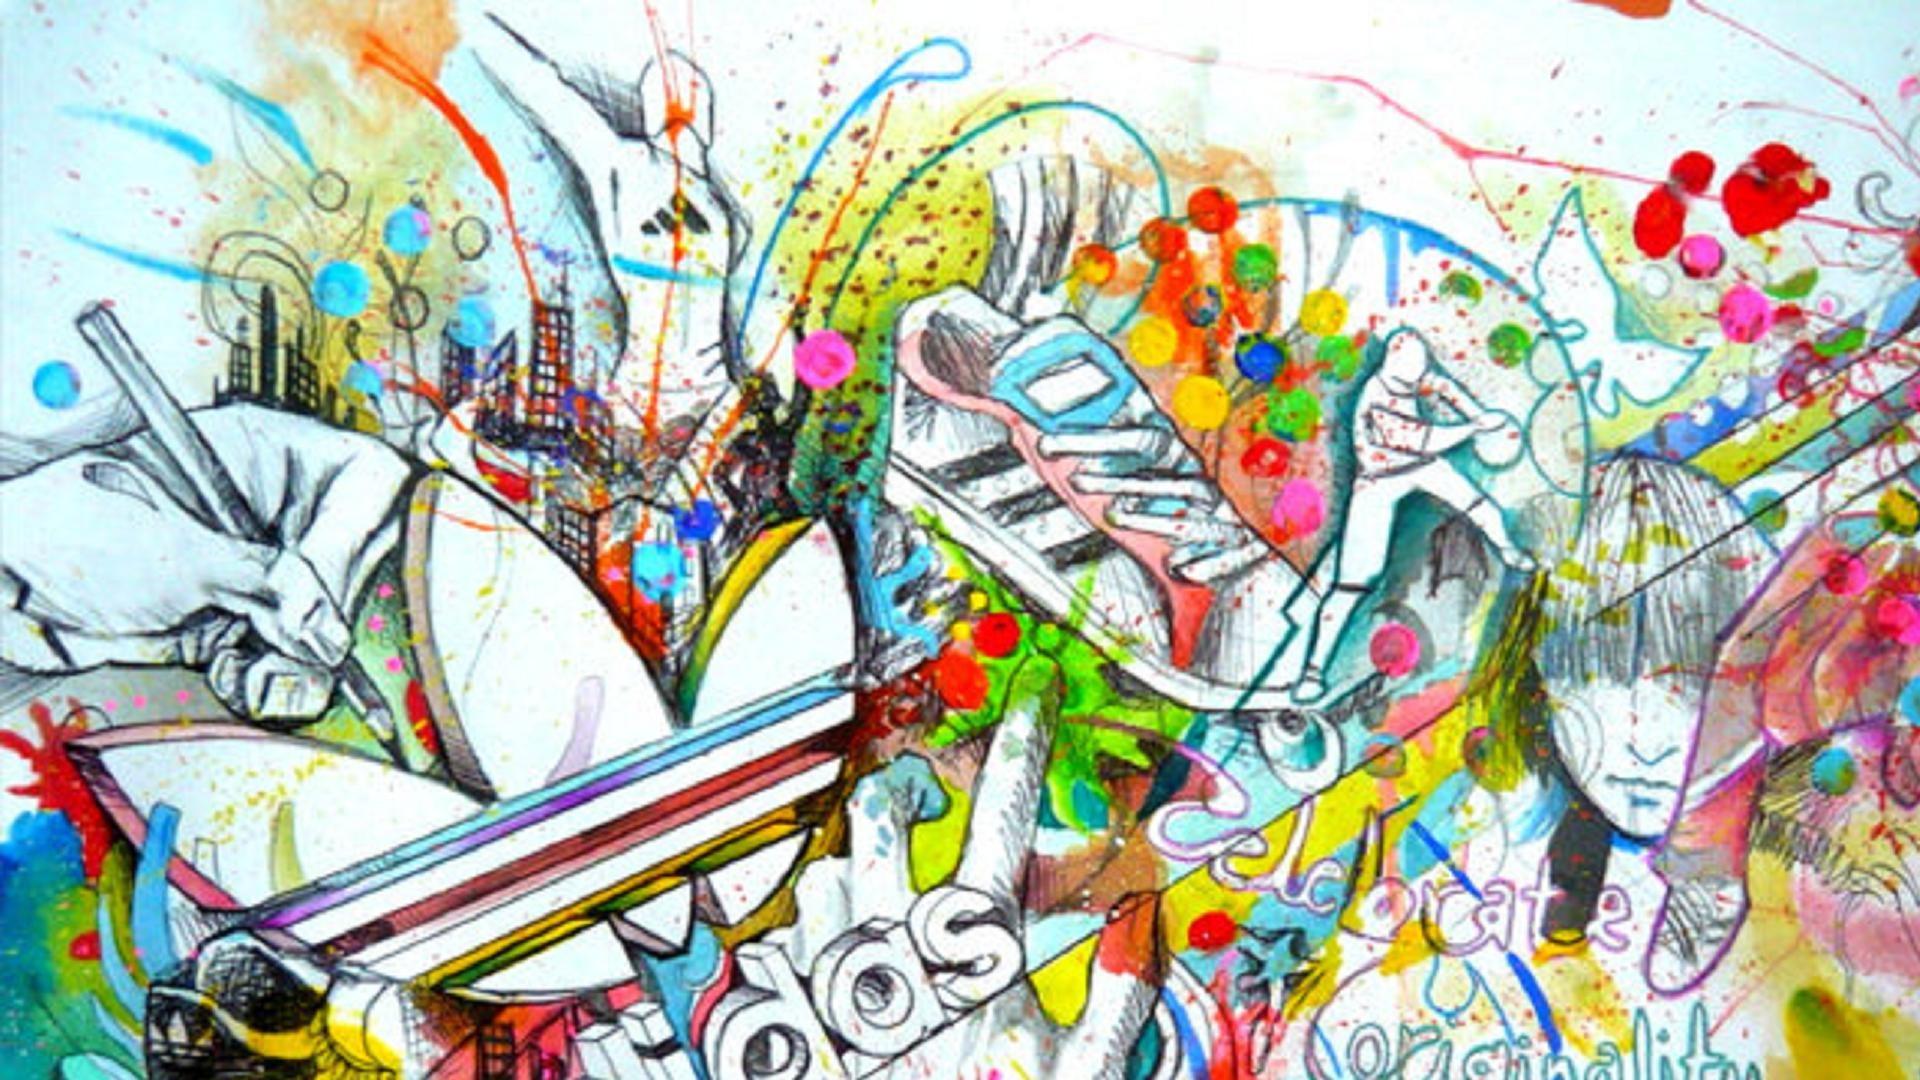 wallpaper, adidaswallpaper, guide, world, change, travel, business, adidas